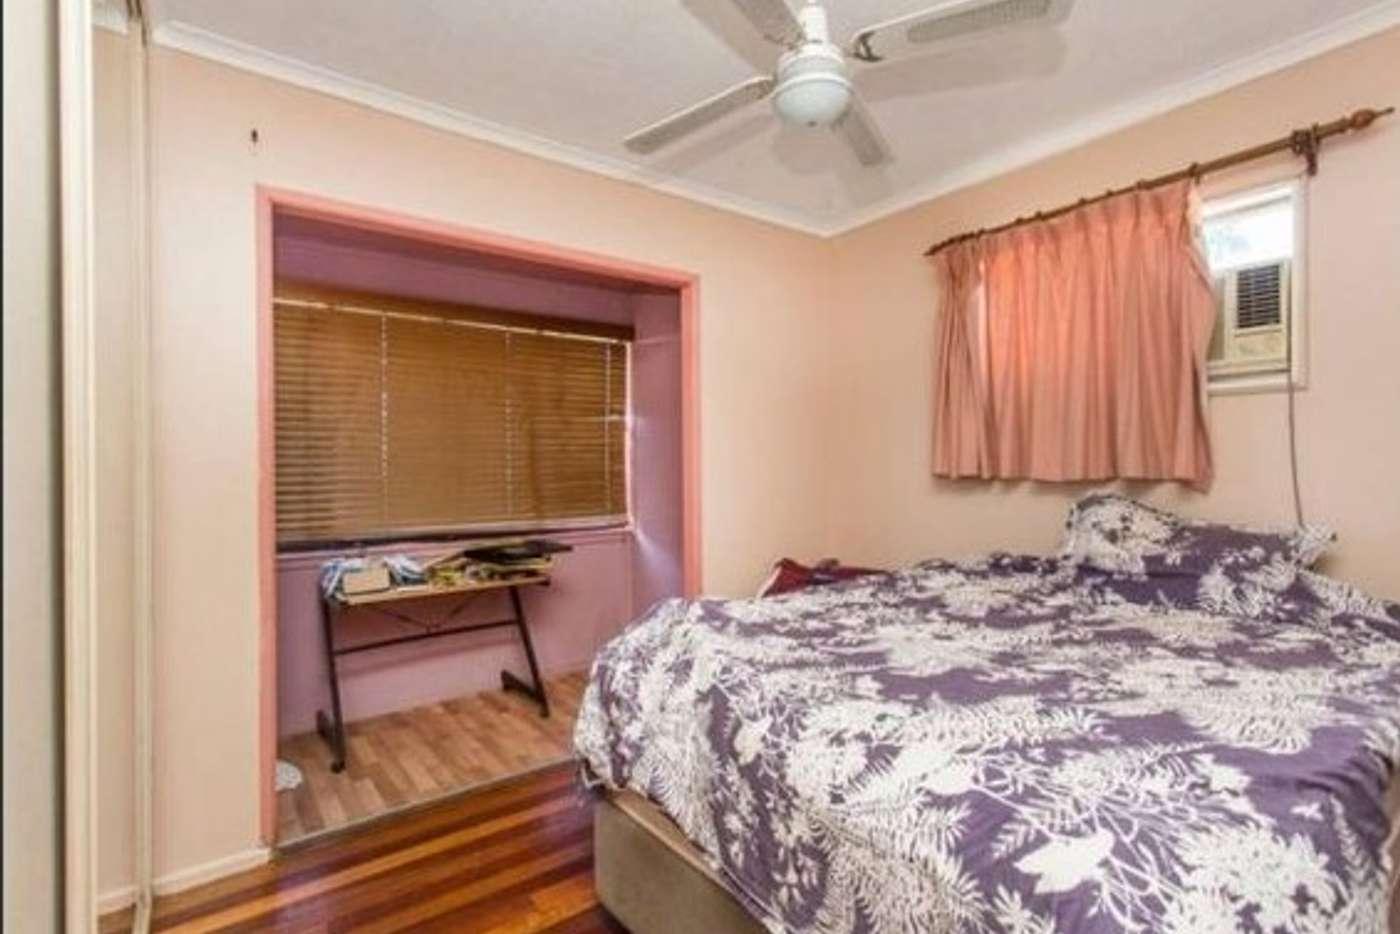 Sixth view of Homely house listing, 25 Macfarlane Street, Kippa-ring QLD 4021